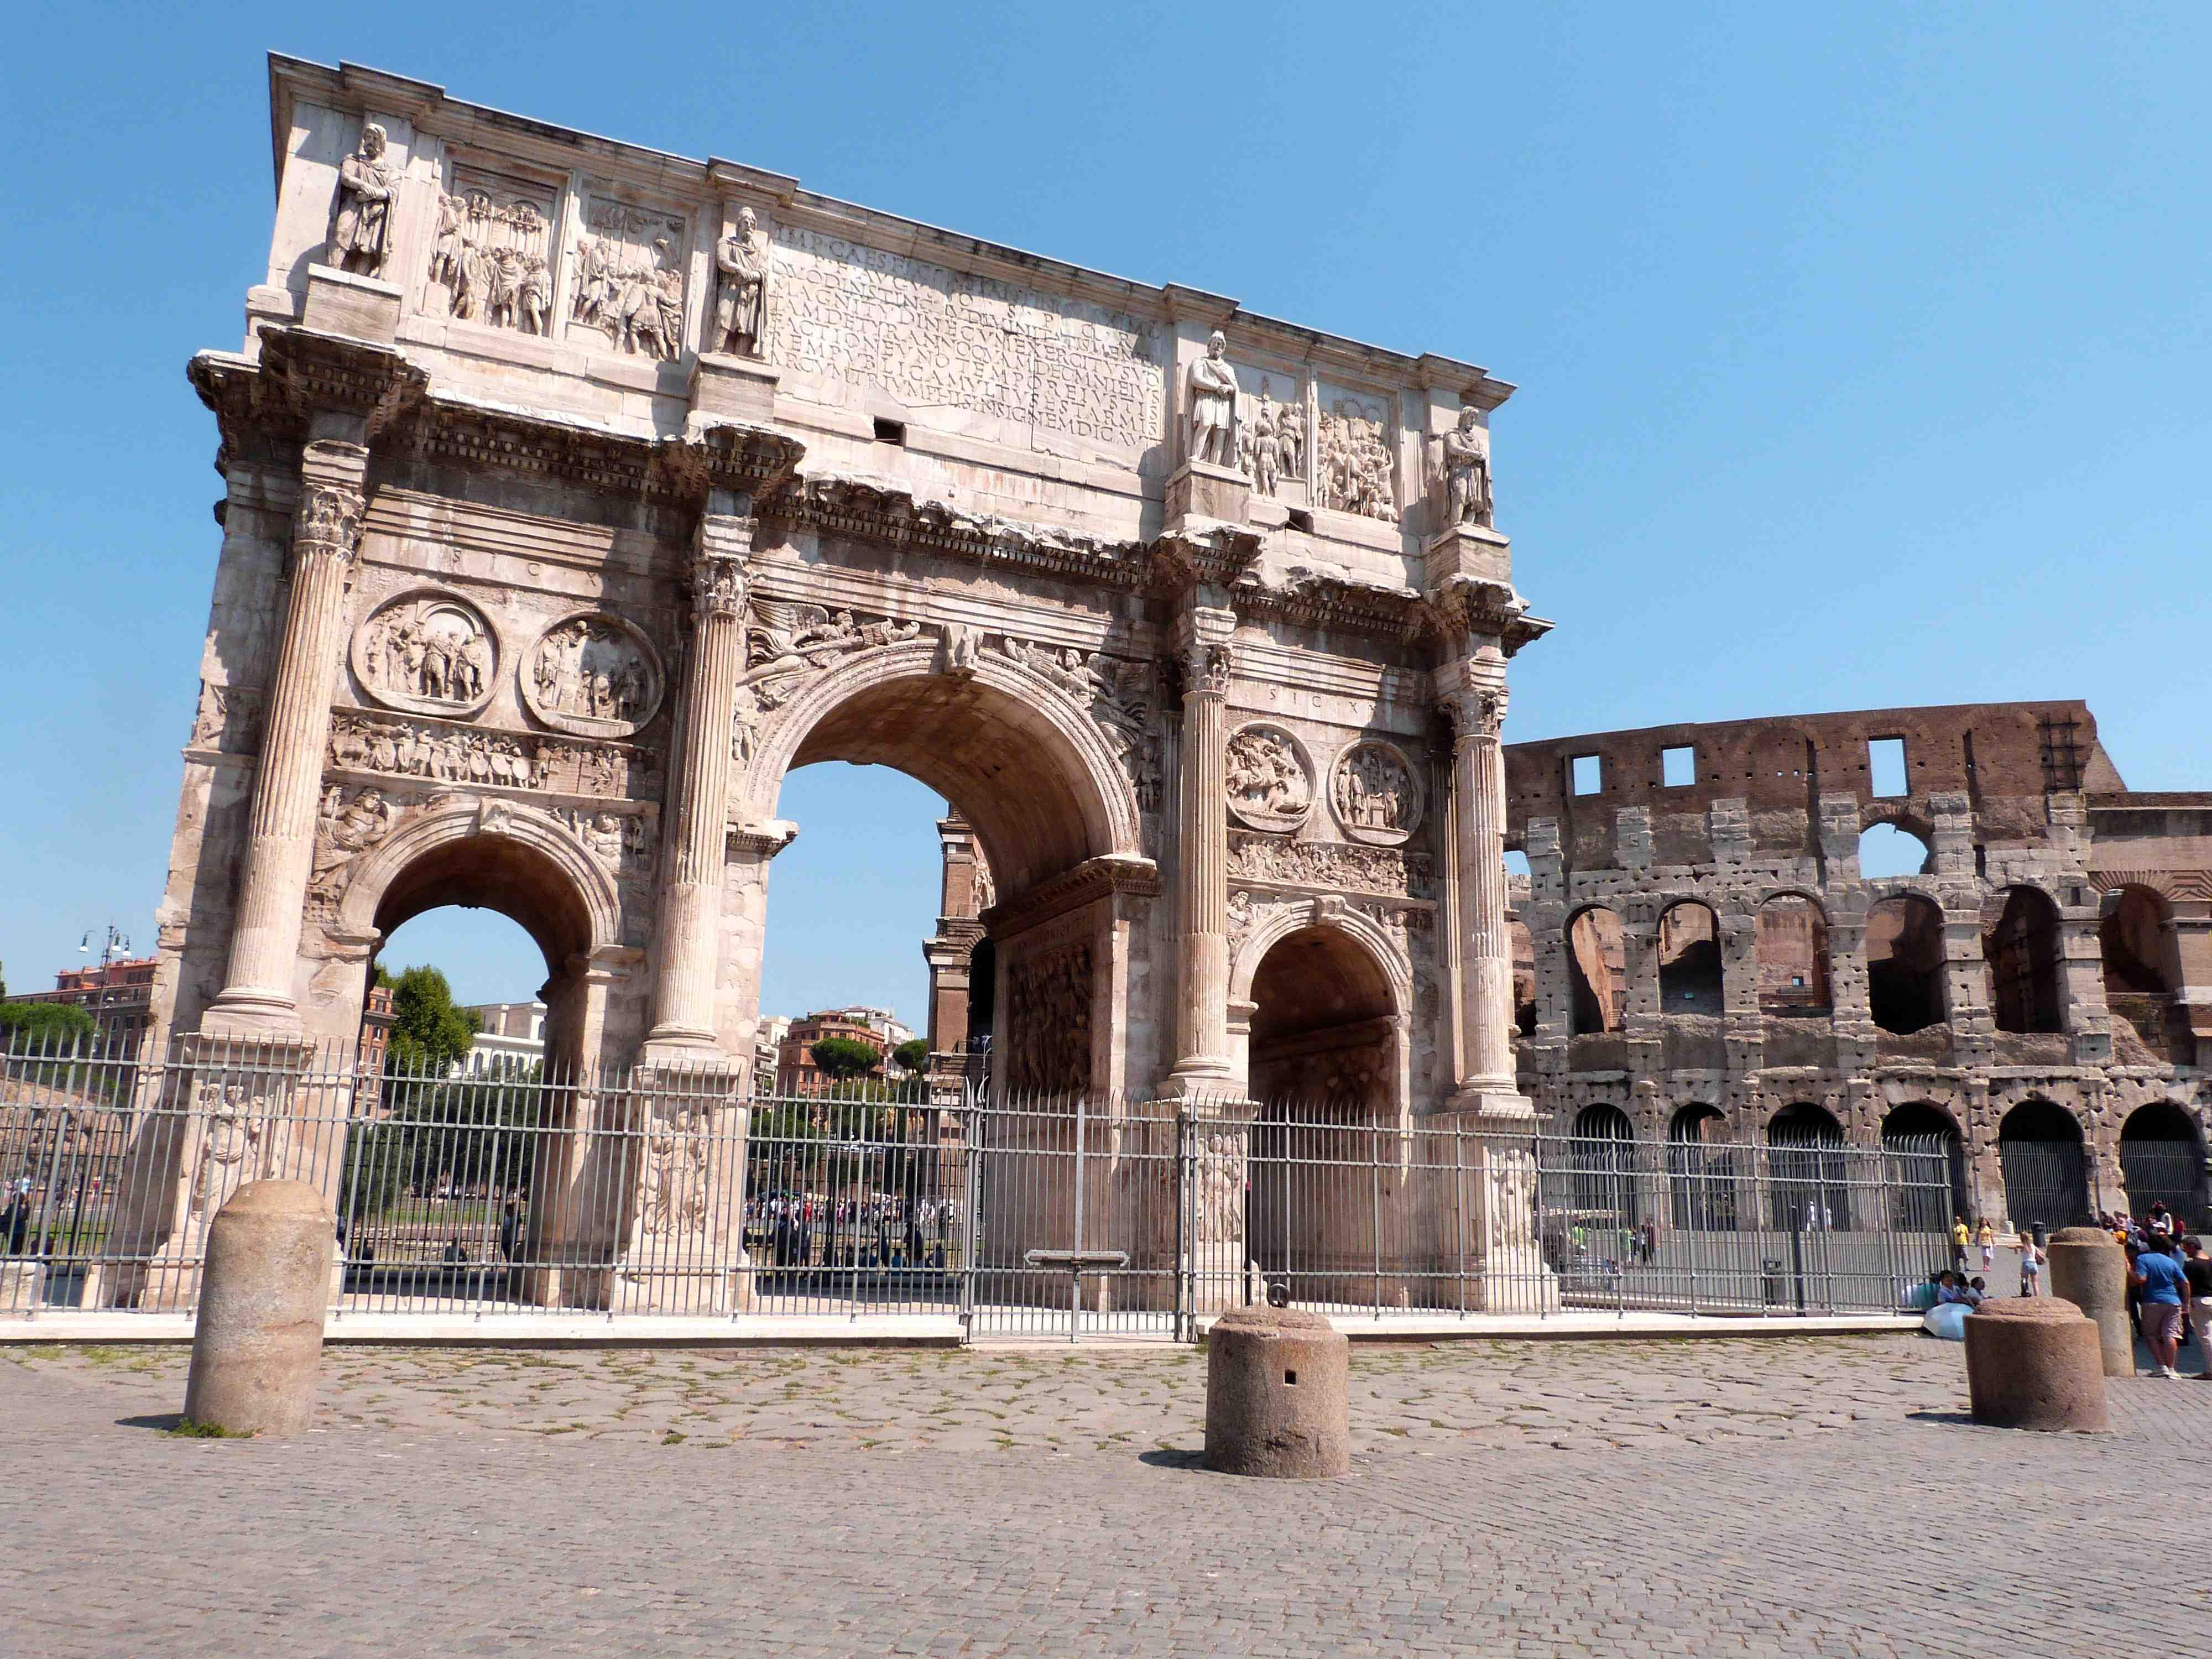 Arc de triomphe et Colisée : Arco di Costantino (arc de Constantin) : Rome antique : Rome : Routard.com